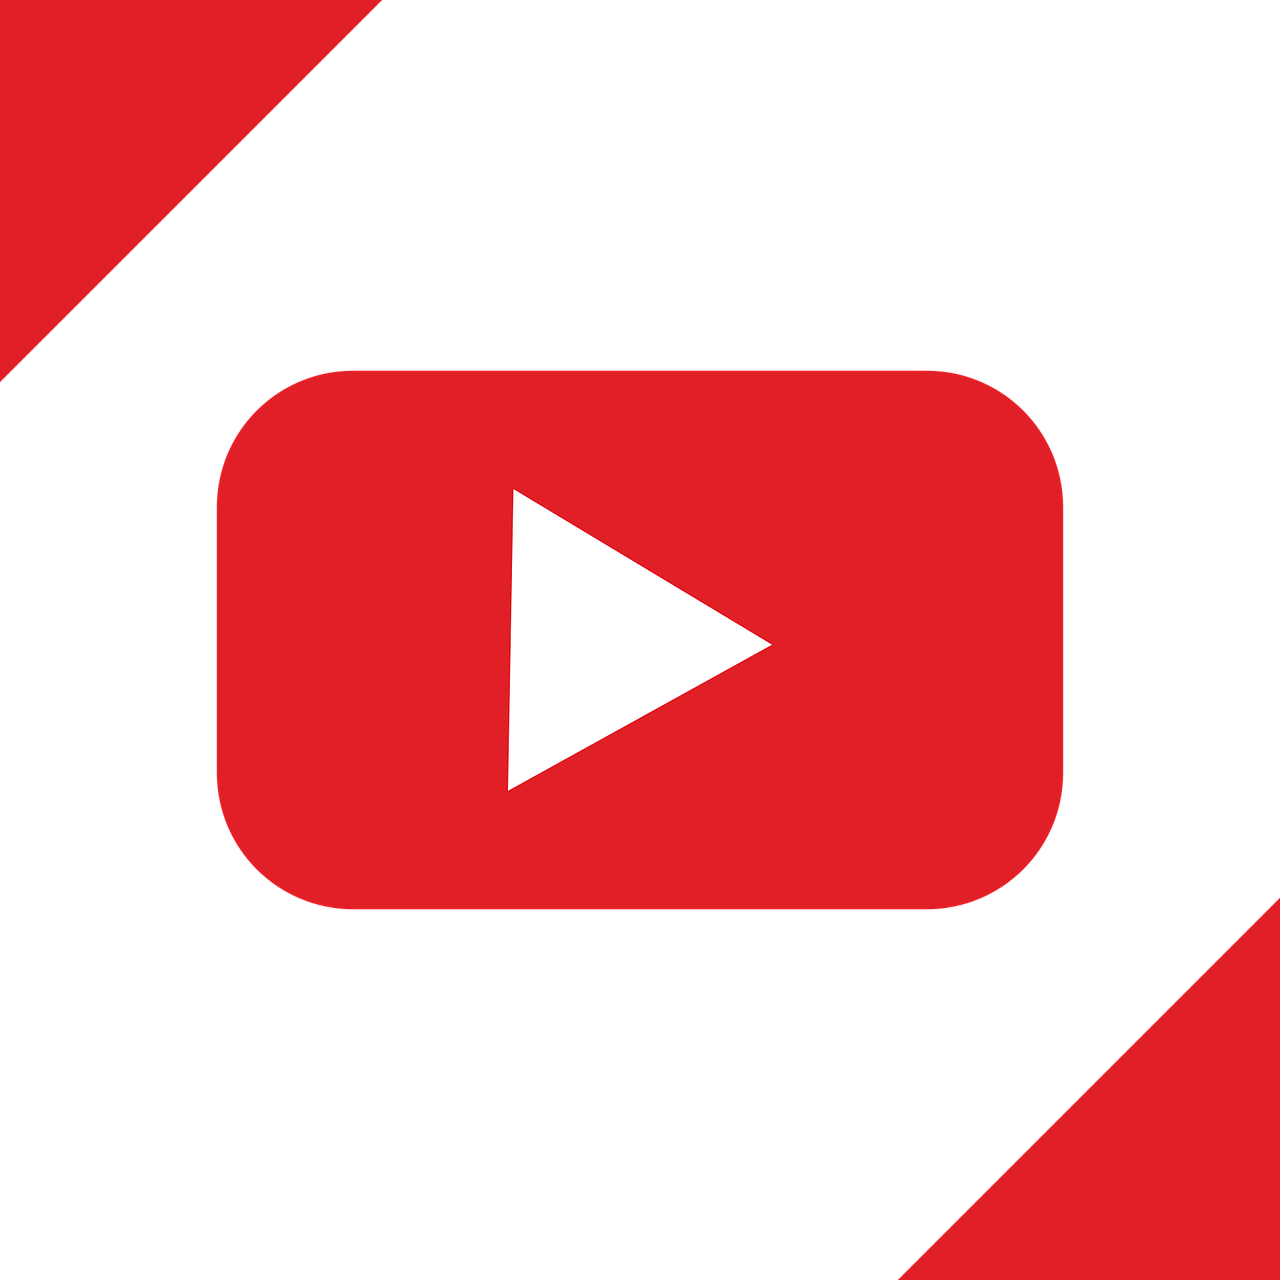 YouTubeマーク